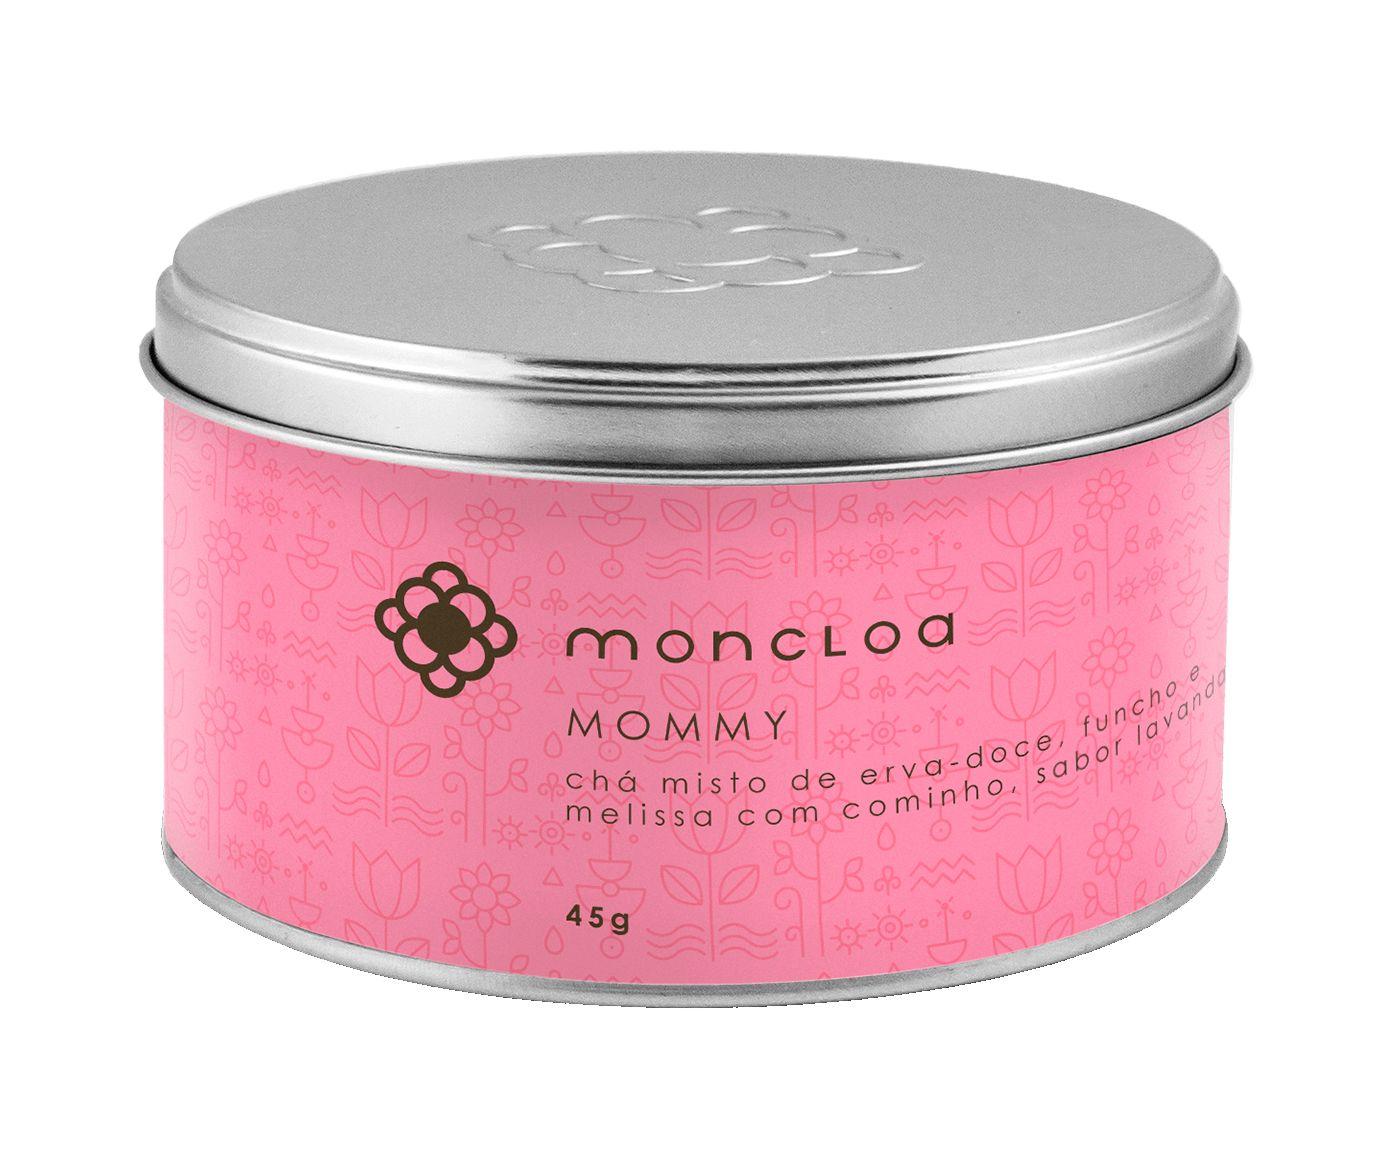 Chá Mommy - 45G | Westwing.com.br